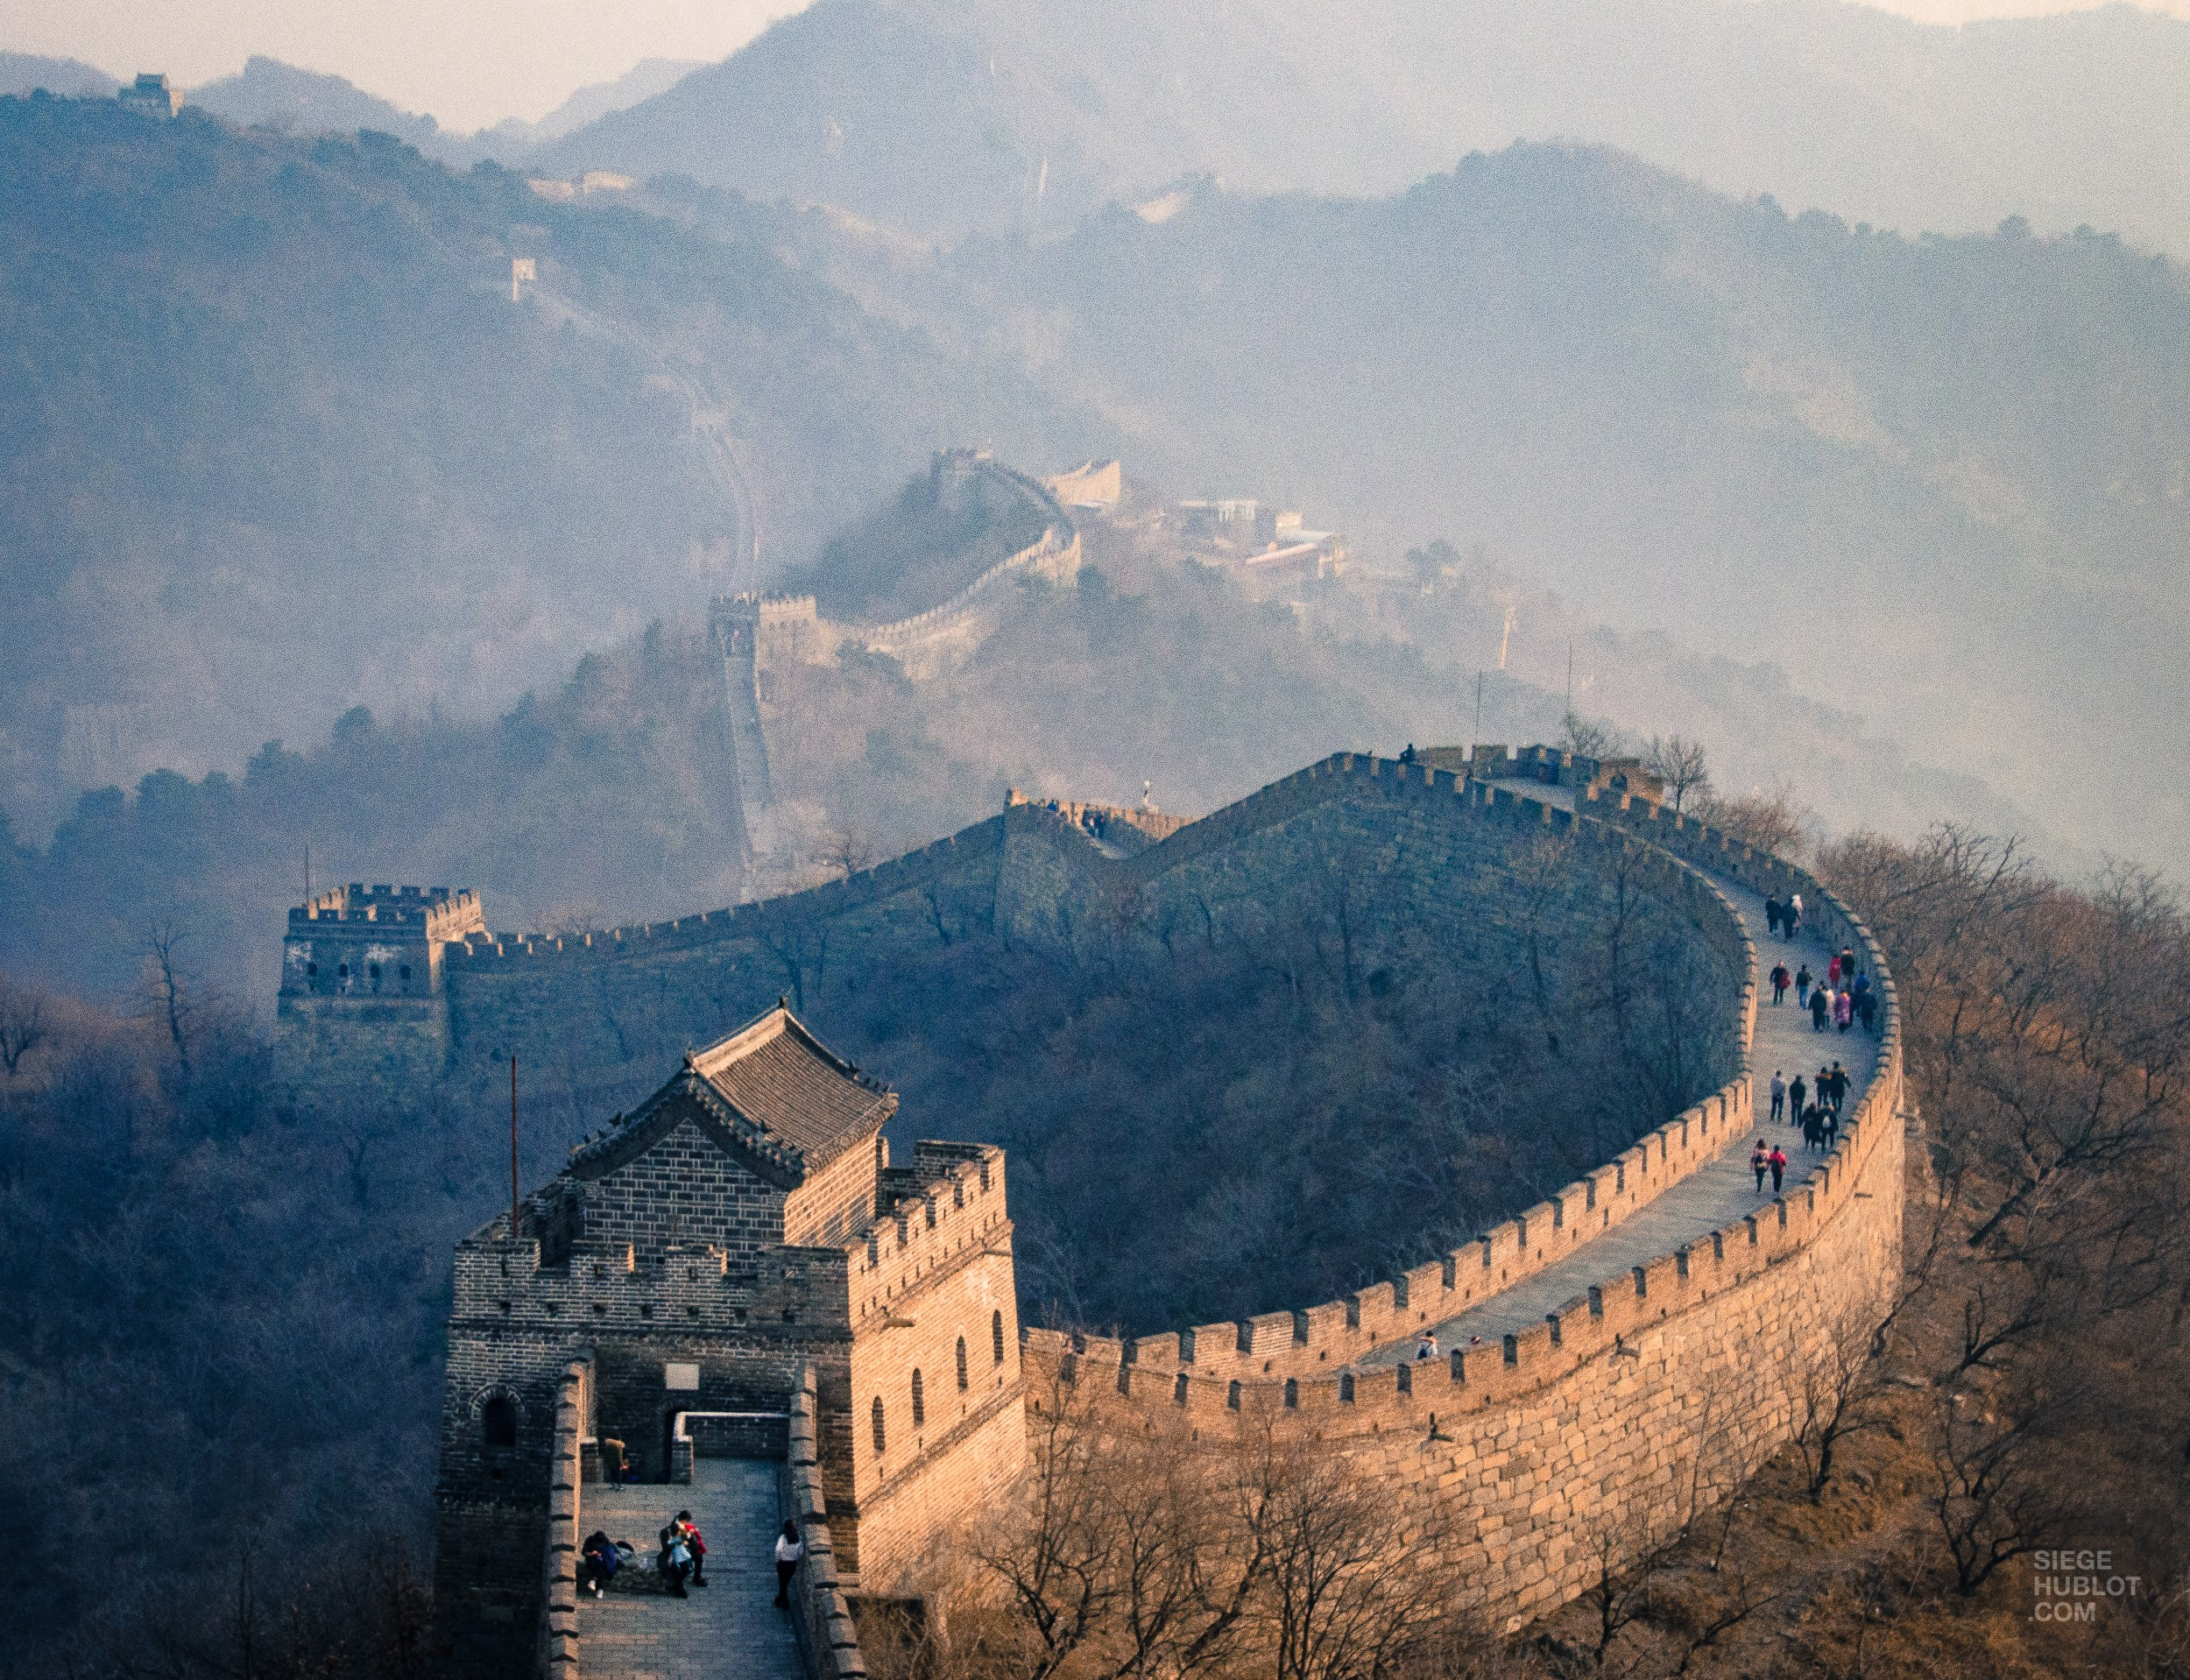 Grande muraille chine - Mutianyu - La Grande Muraille de Chine, un lieu mythique - Asie, Chine